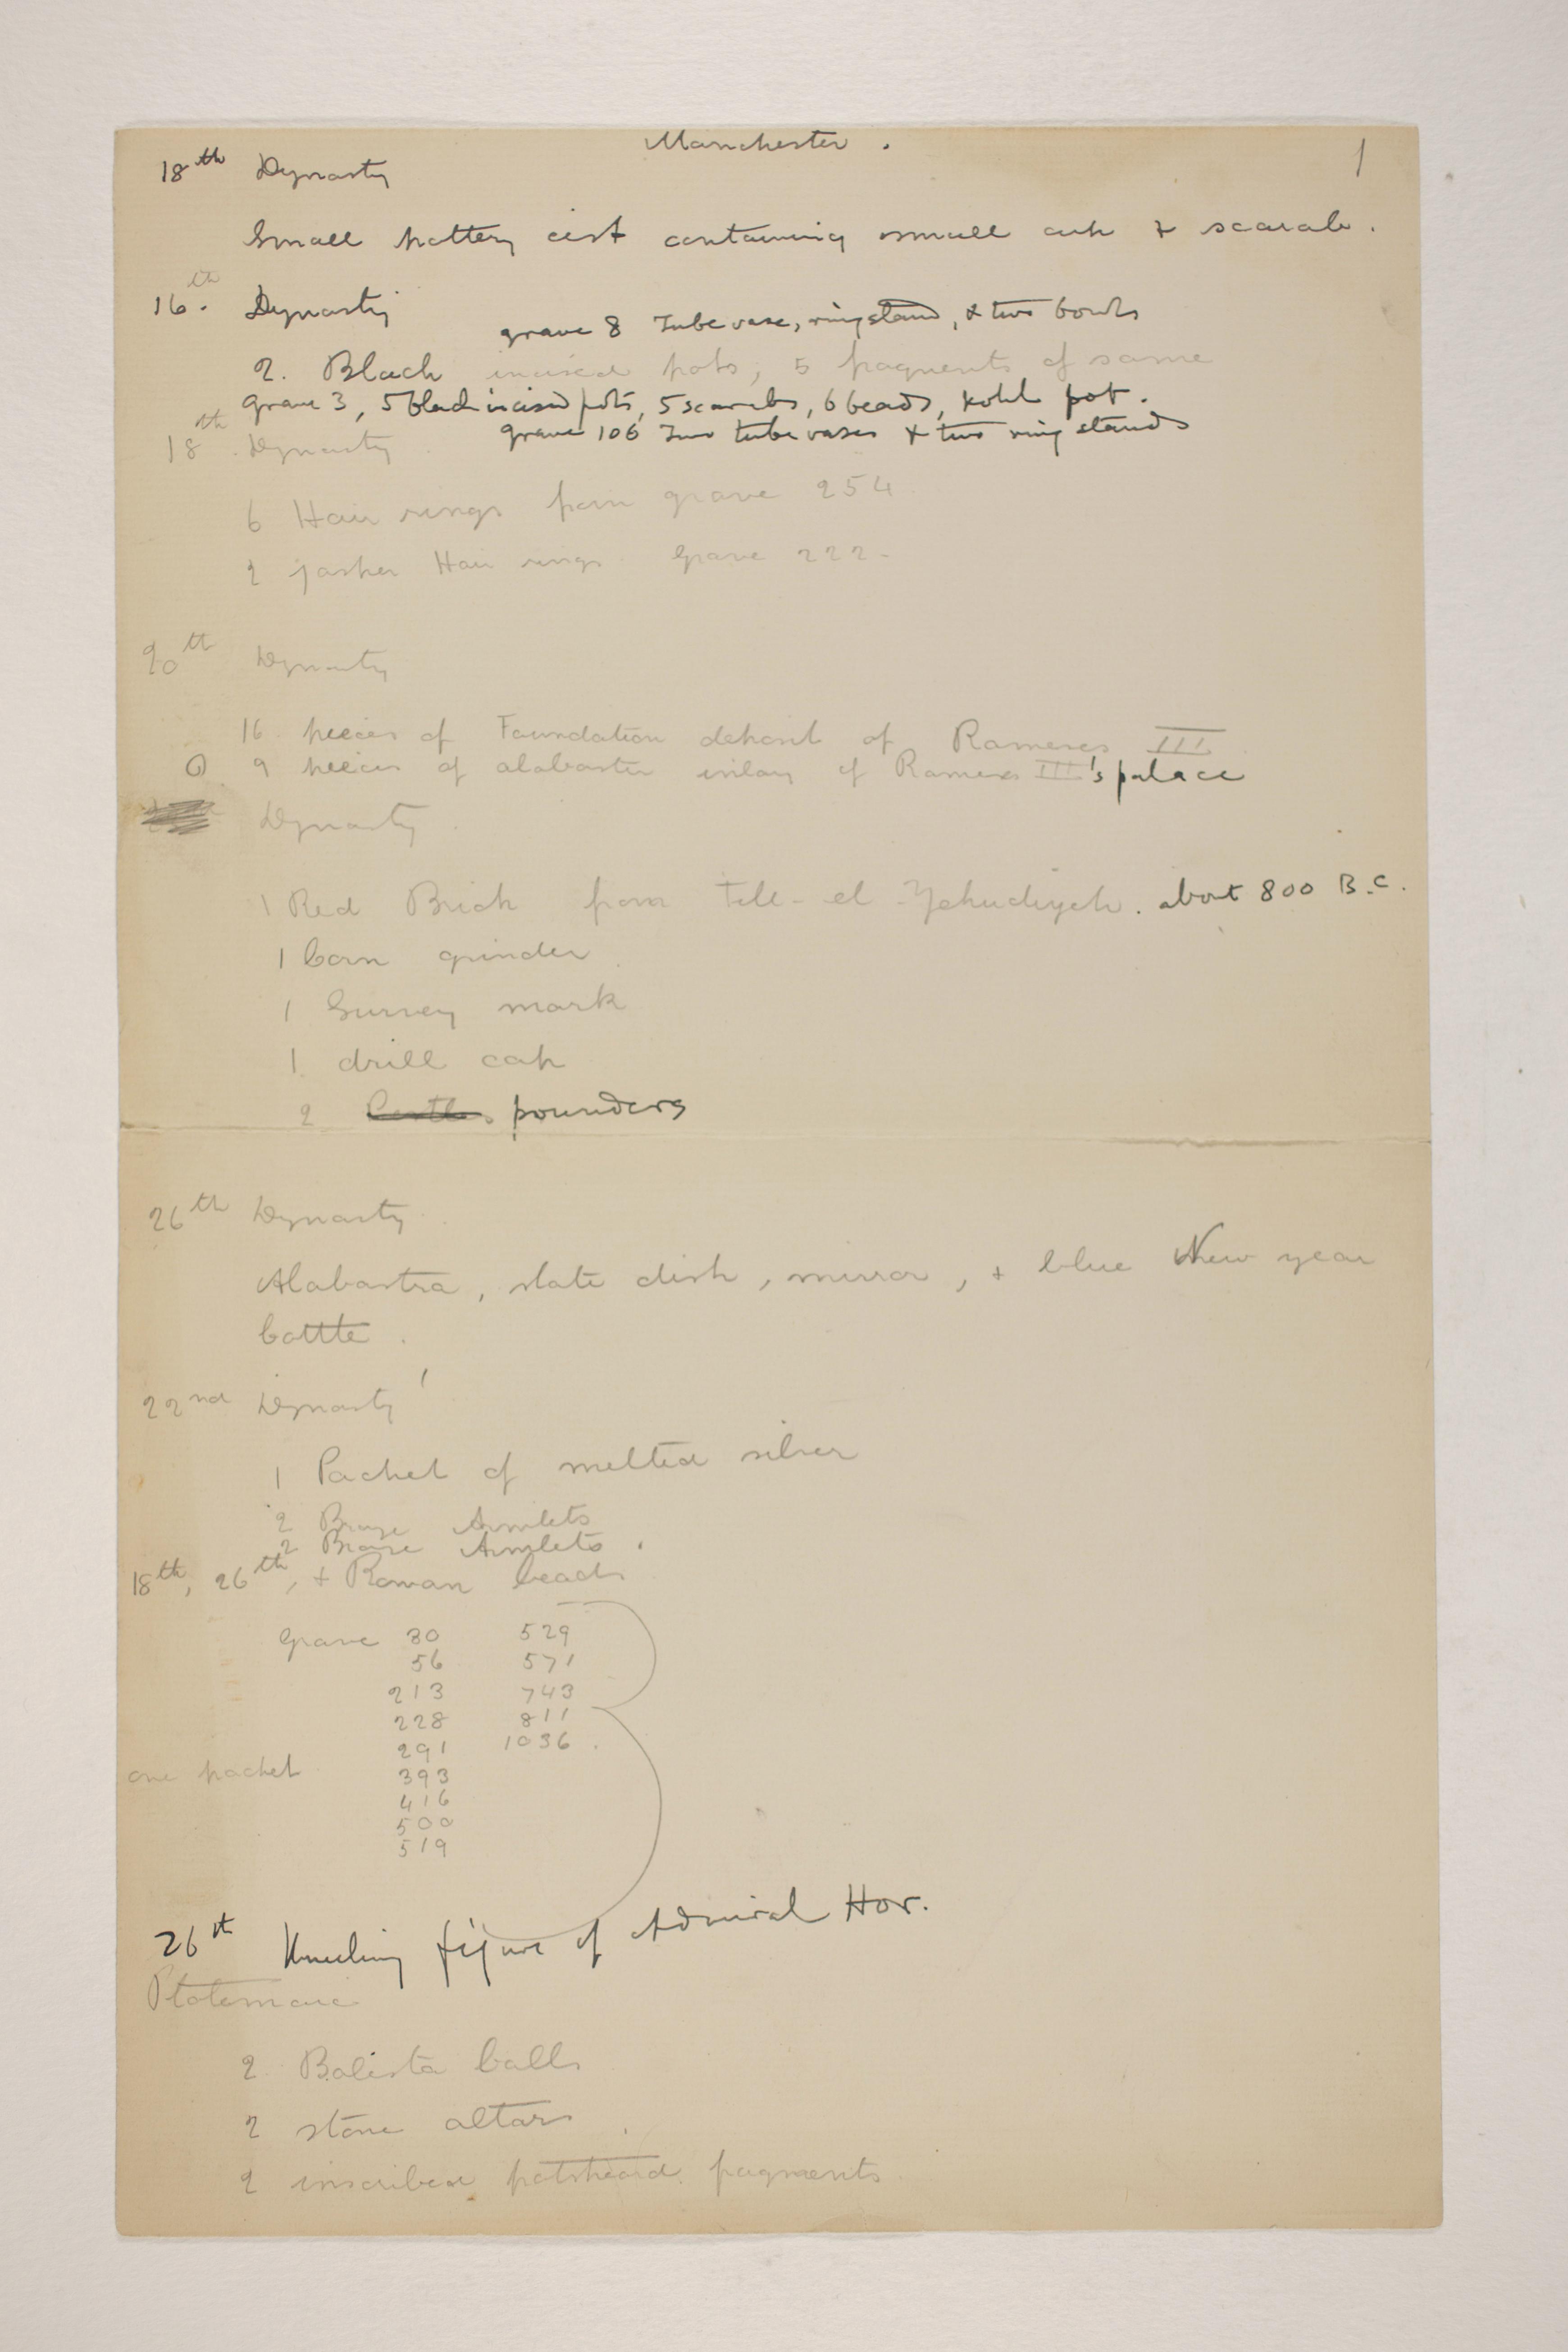 1905-06 Eastern Delta: Belbeis, Tell el-Rataba, Saft el-Hinna, Tell el-Yahudiya, Shaghanbeh, Ghita Individual institution list  PMA/WFP1/D/14/18.1